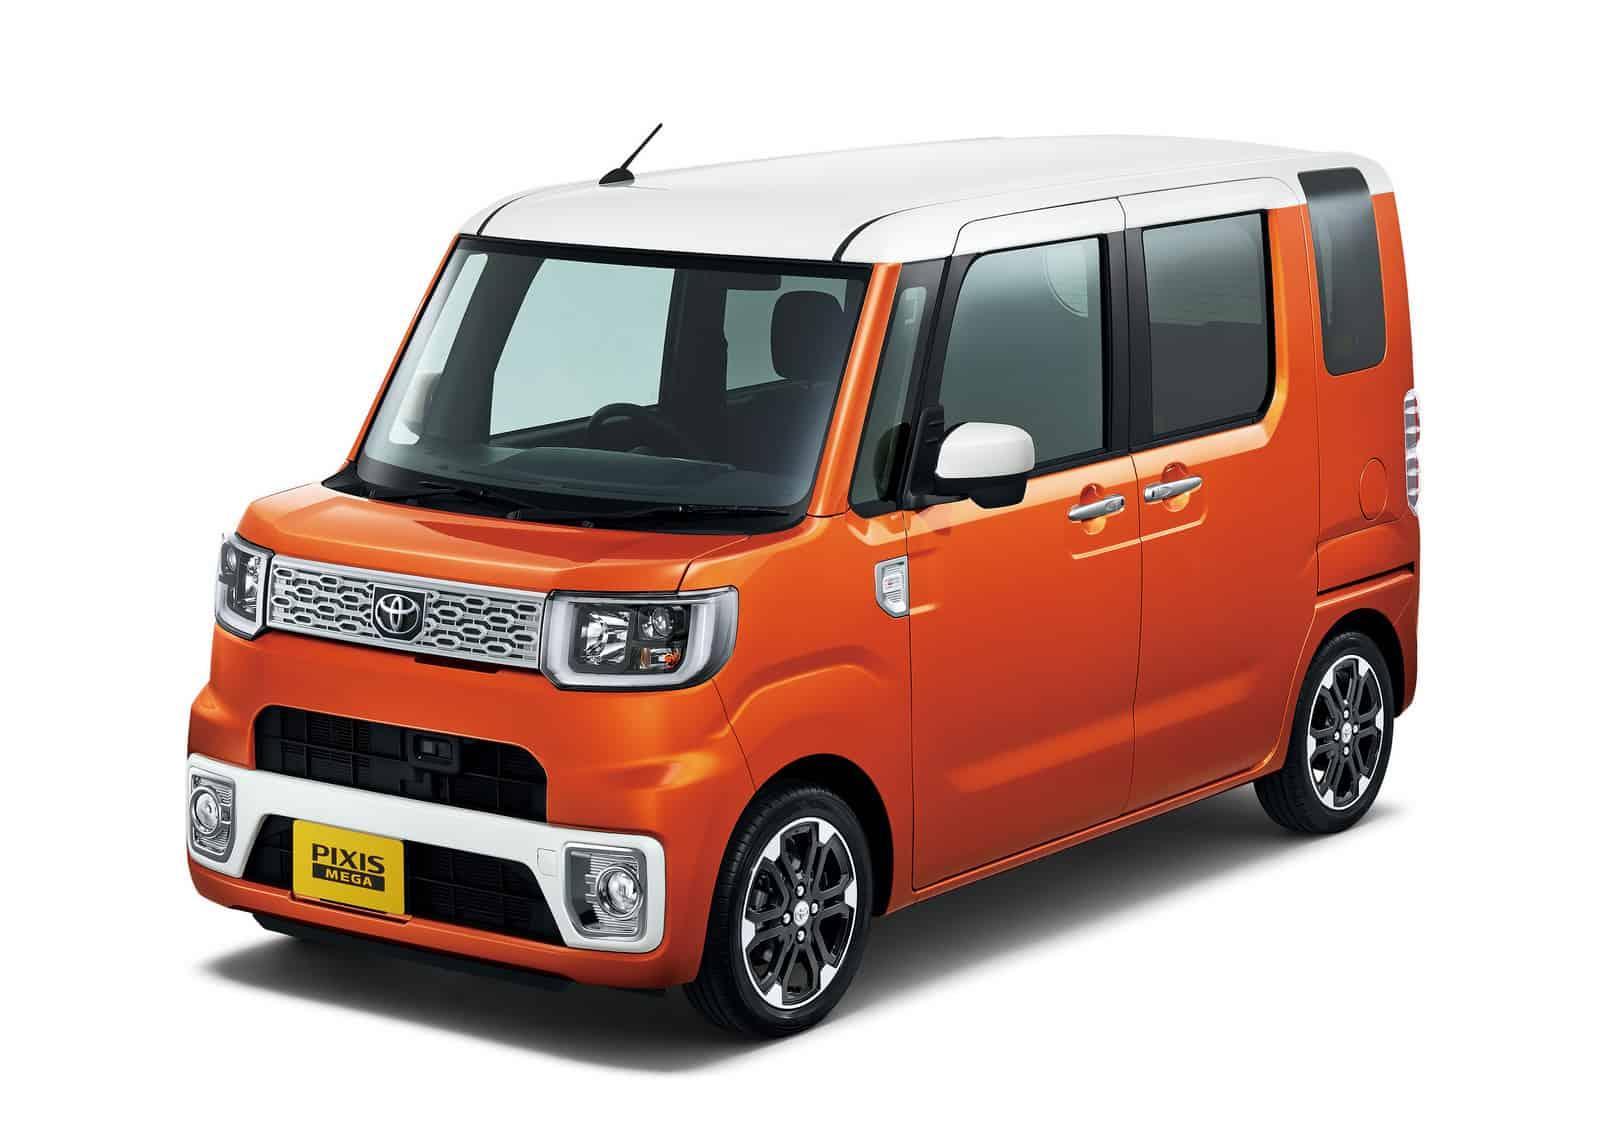 Toyota Pixis Mega Kei Car